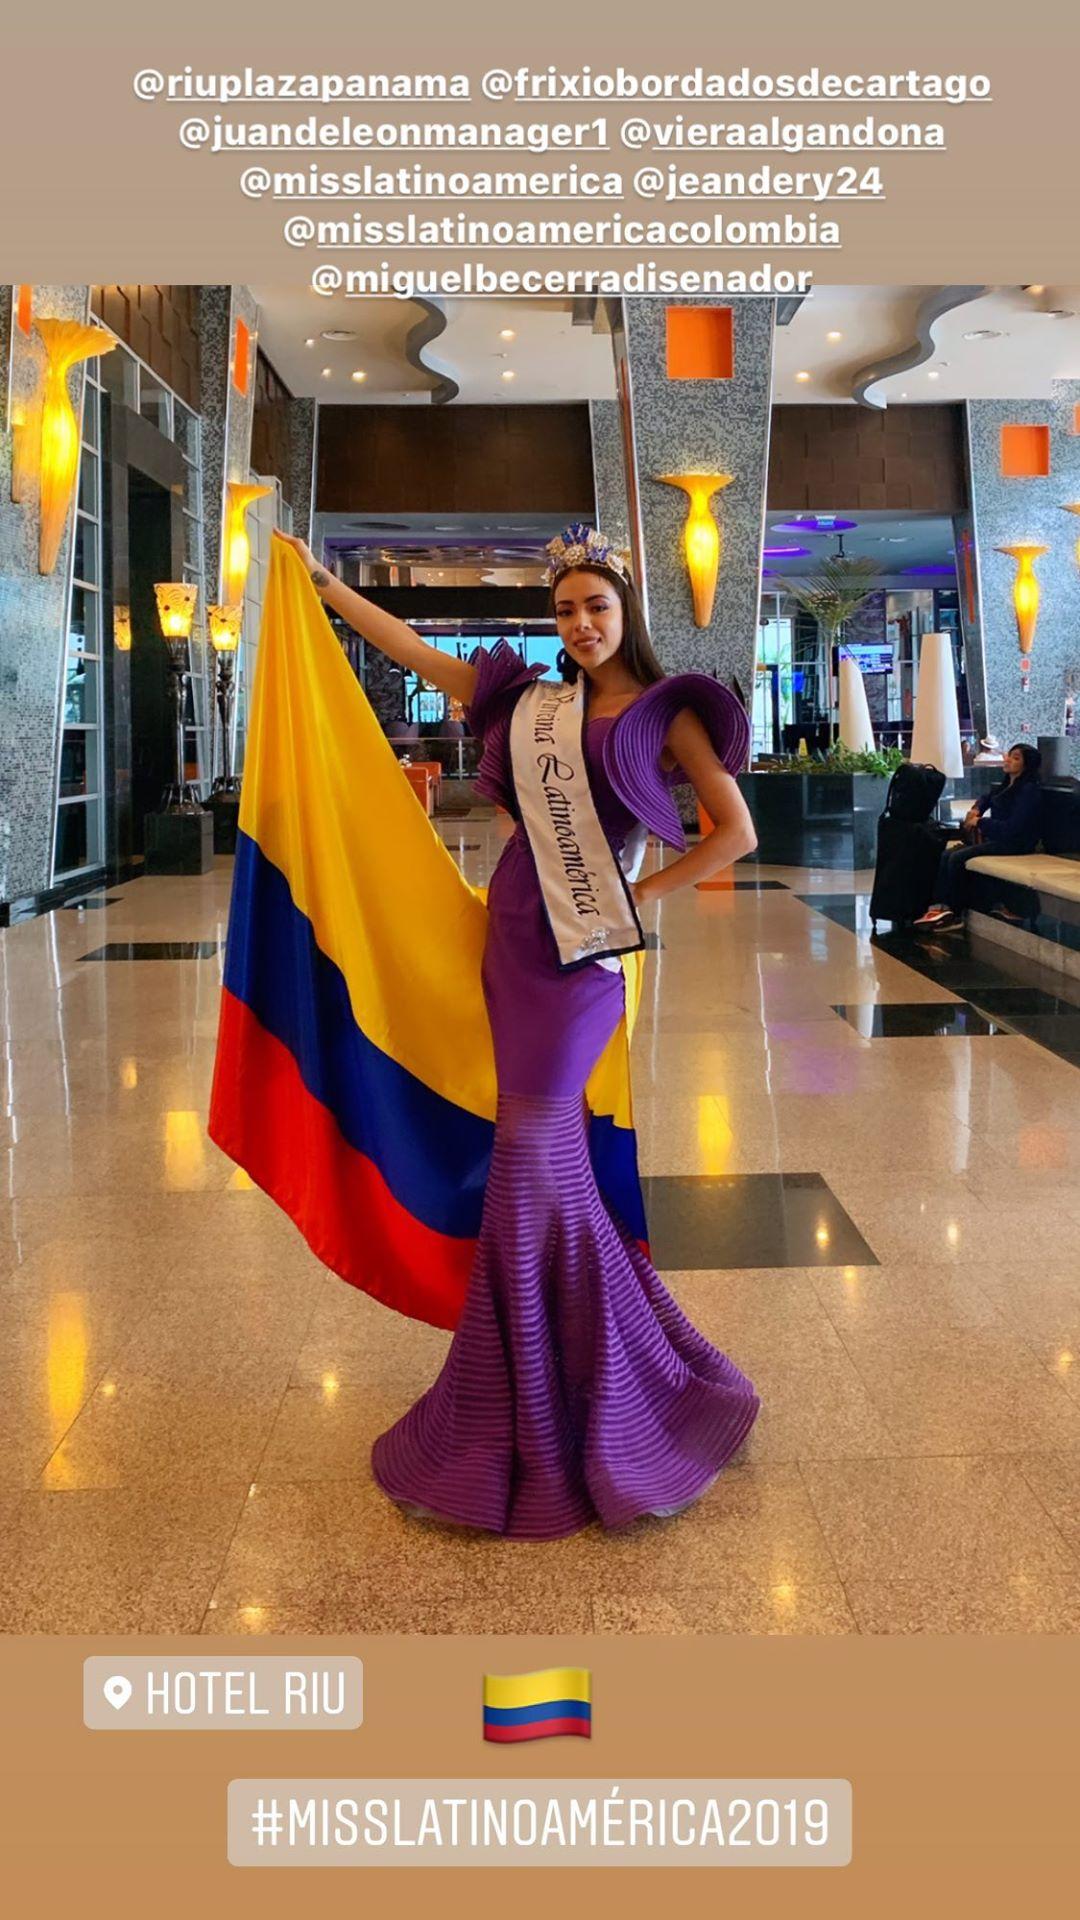 gina aguirre, virreyna de miss latinoamerica 2019. - Página 6 69708010